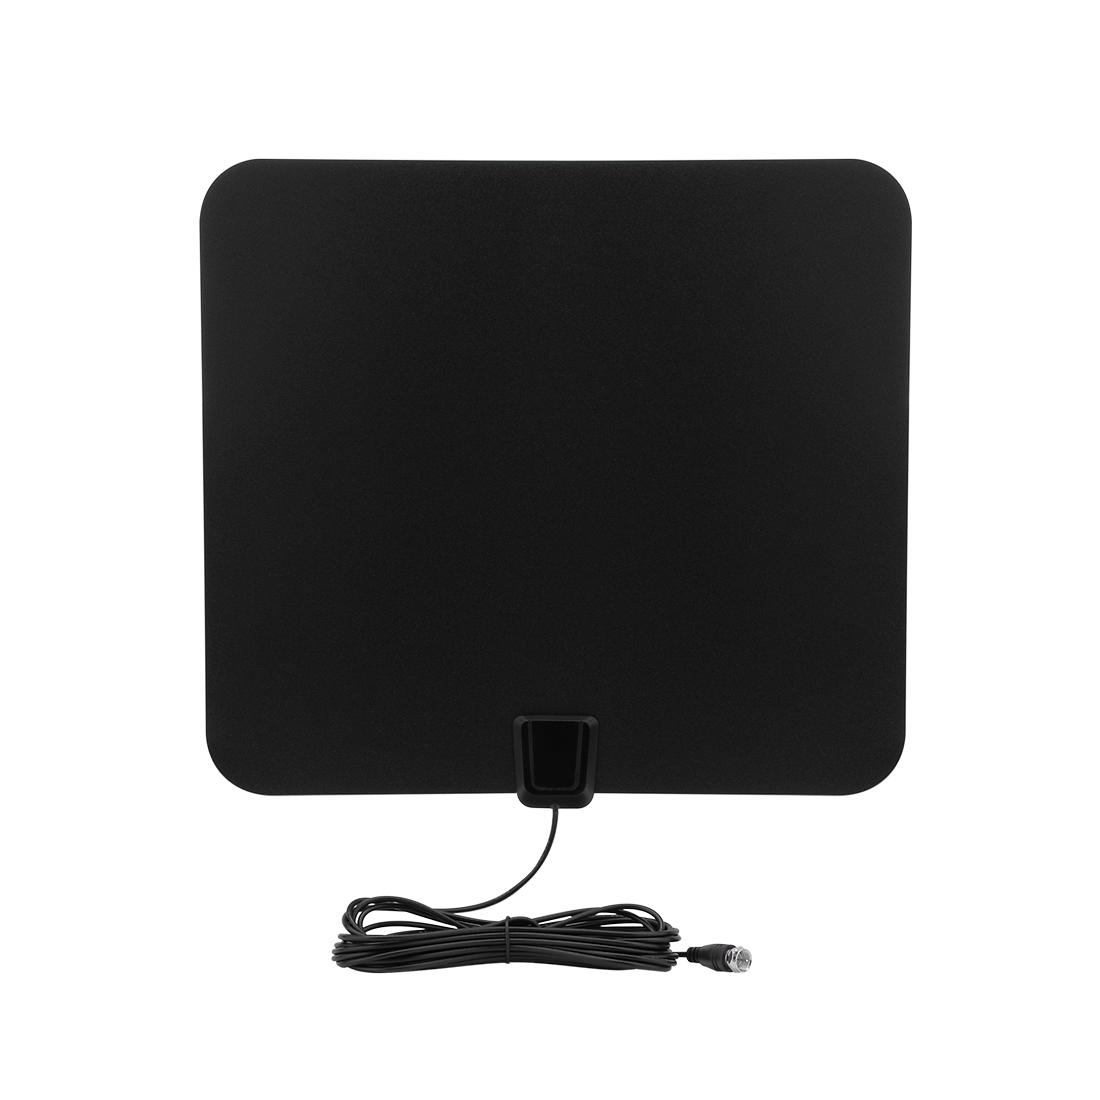 50 Miles Digital TV Antennas with USB Powered Digital TV Flat Antenna (UK Plug) - image 8 of 8